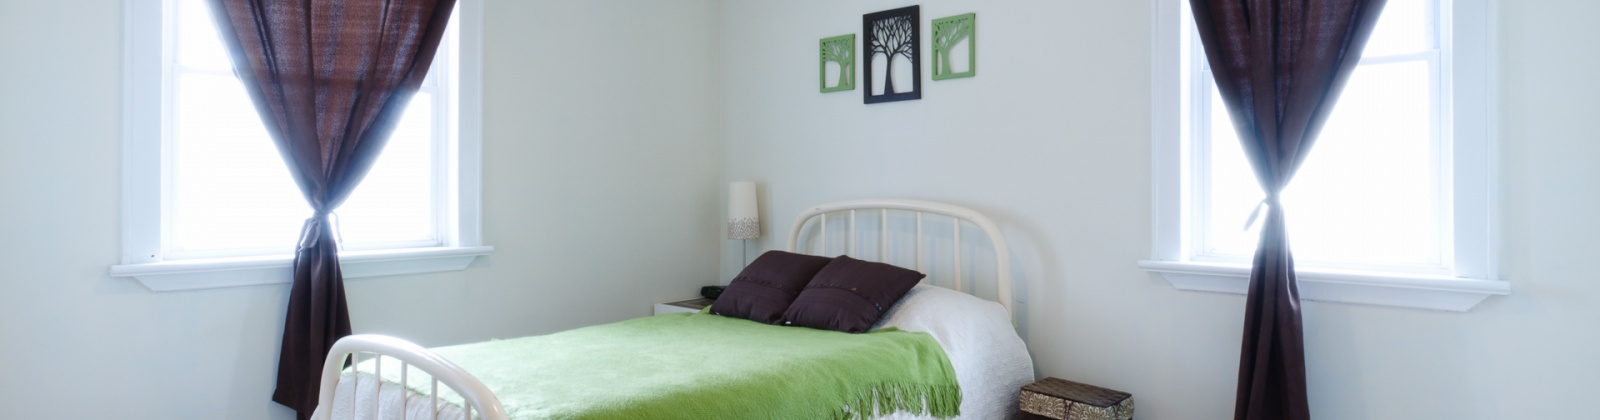 This property is SOLD.,2 Bedrooms Bedrooms,2 Rooms Rooms,1 BathroomBathrooms,Detached,William Street,1005